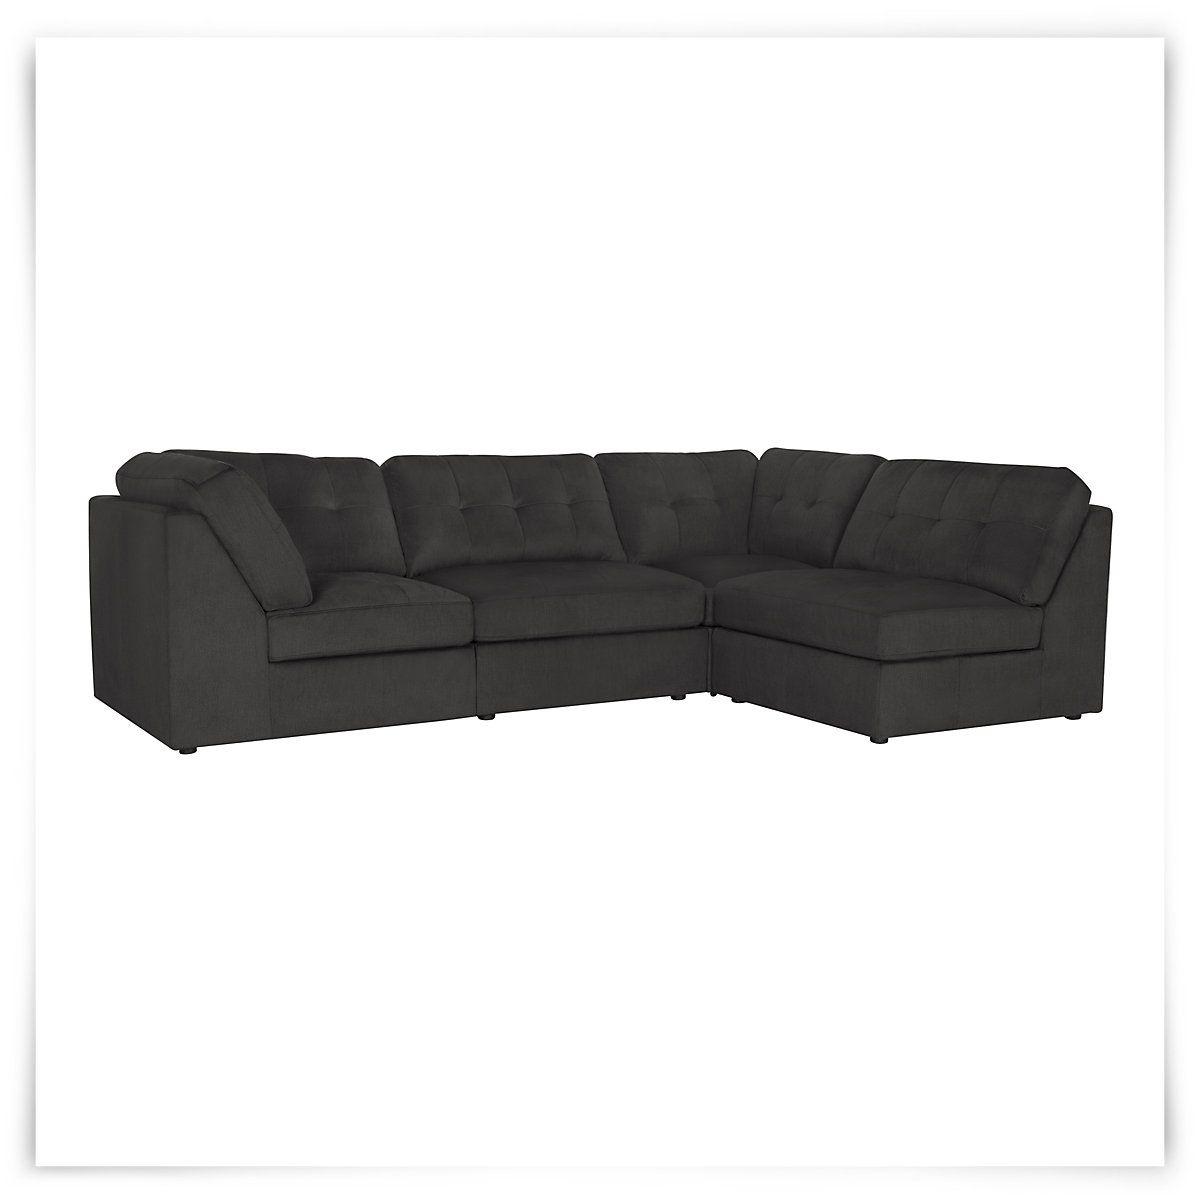 Super City Furniture Galaxy Dk Gray Fabric 4 Piece Modular Beatyapartments Chair Design Images Beatyapartmentscom